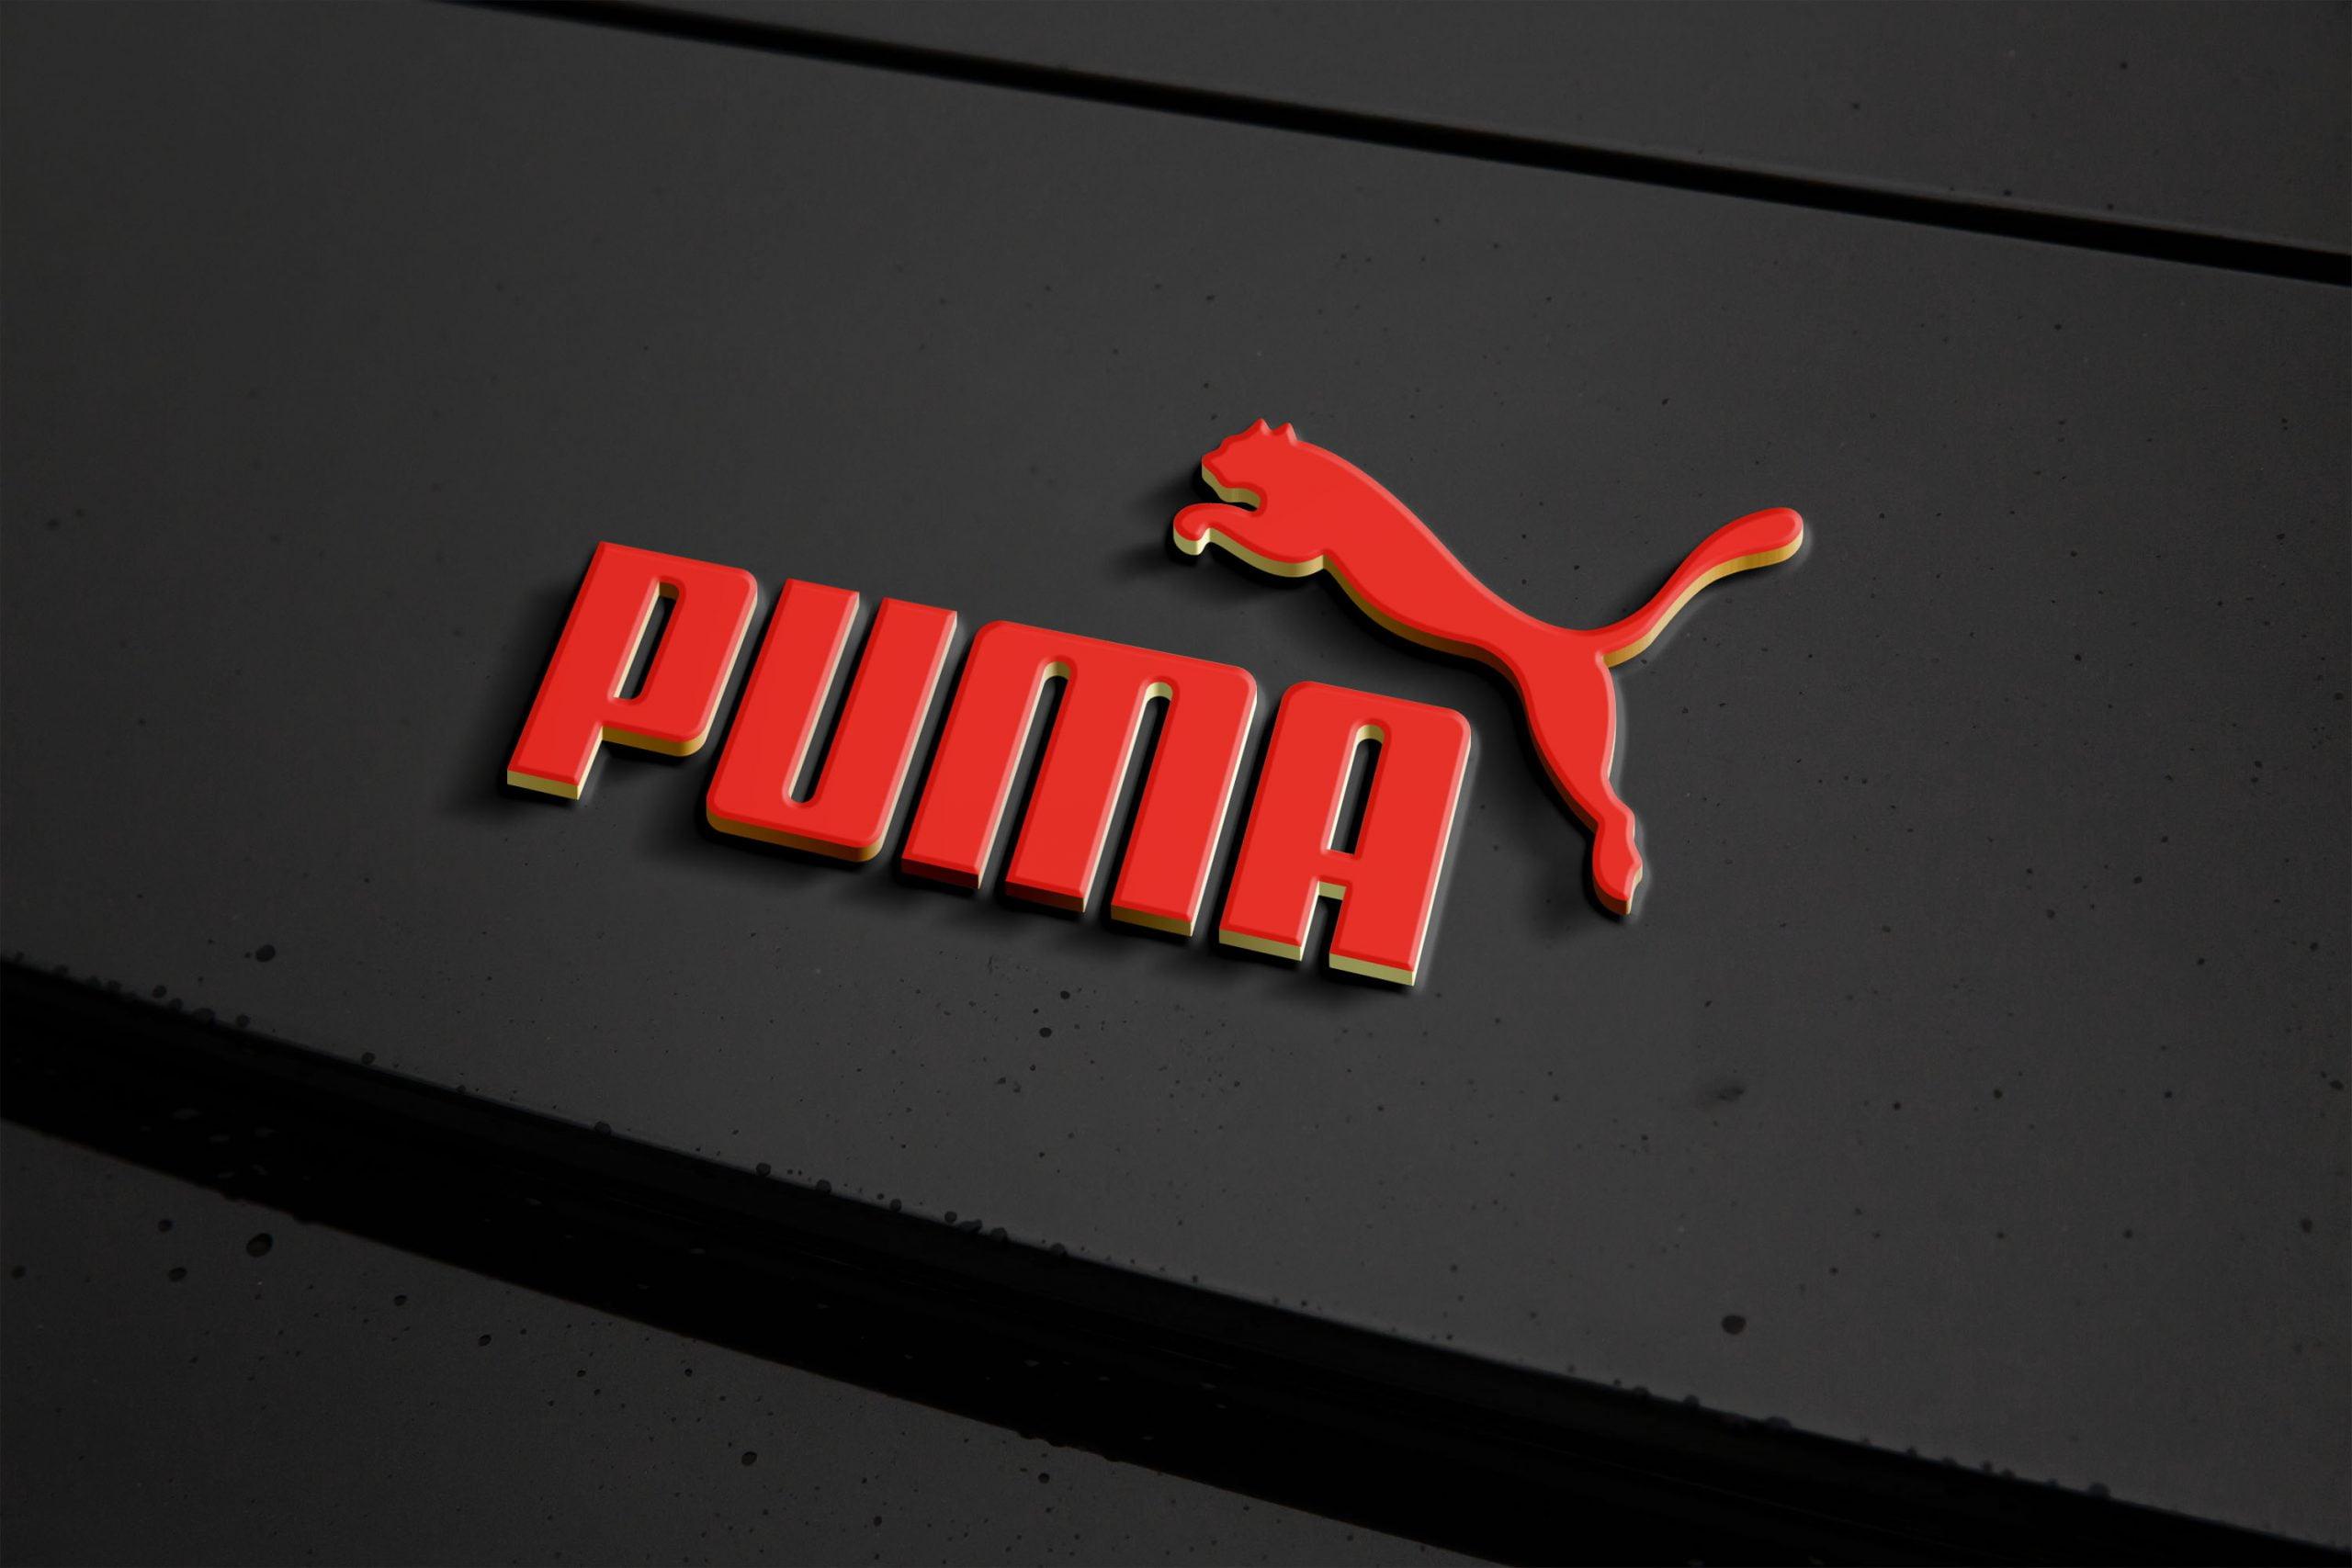 Metal Logo Effect Mockup Puma